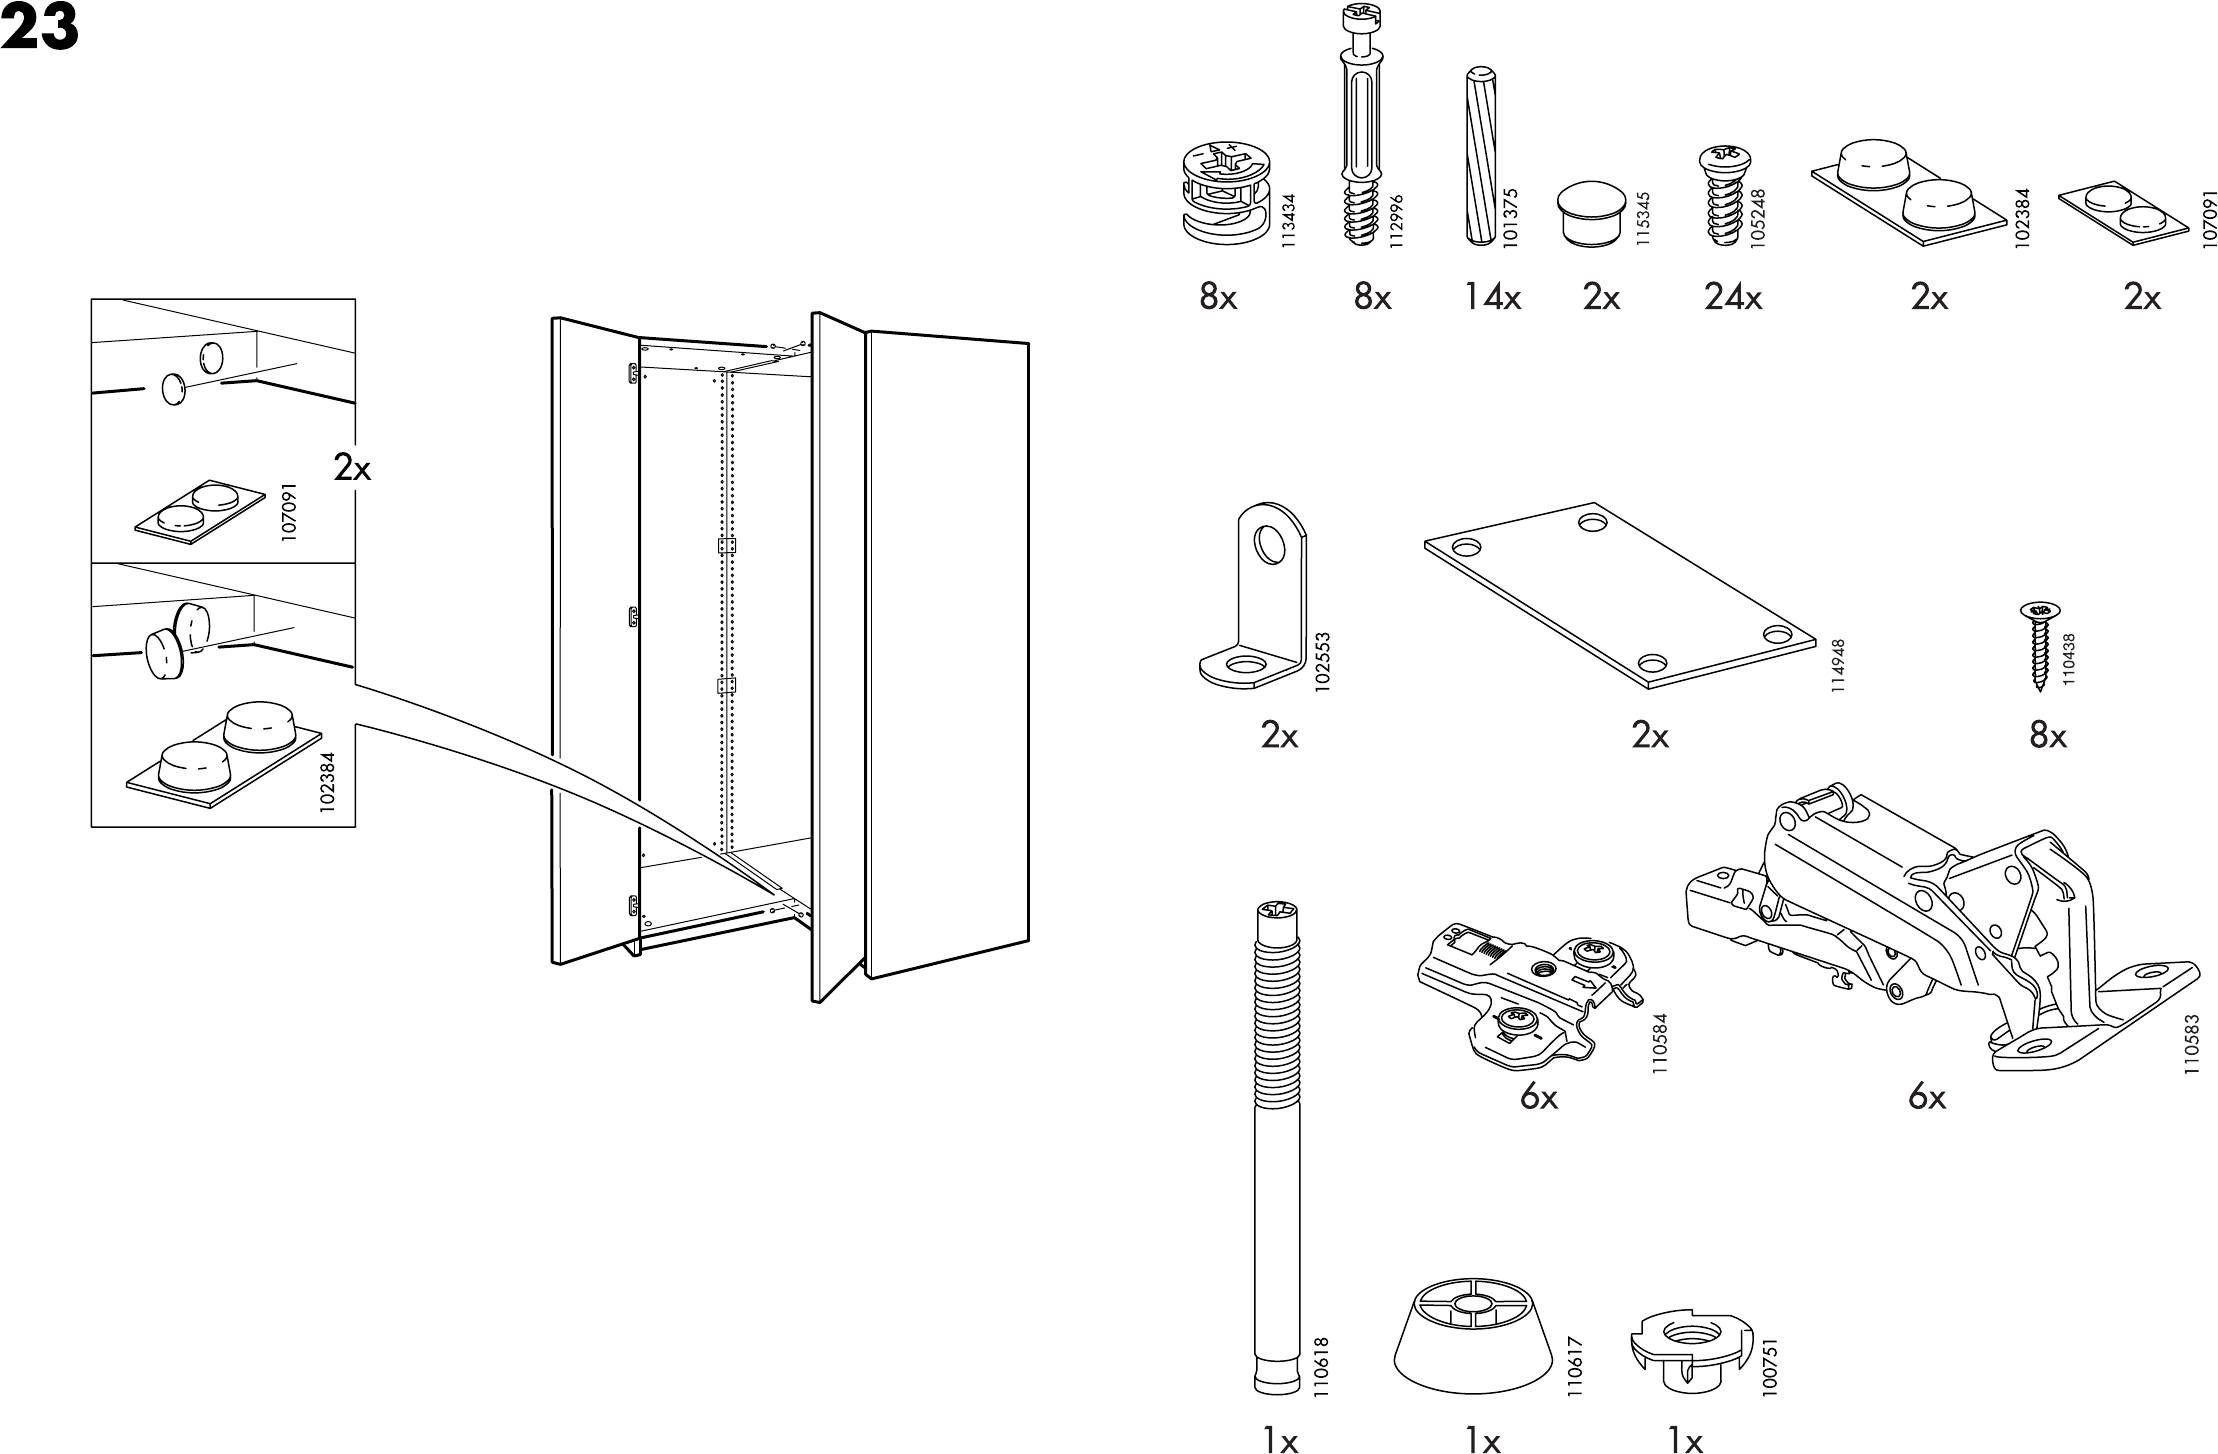 Grundtal Towel Stand From Ikea ~ Handleiding Ikea Pax hoekkast (pagina 3 van 18) (Dansk, Deutsch